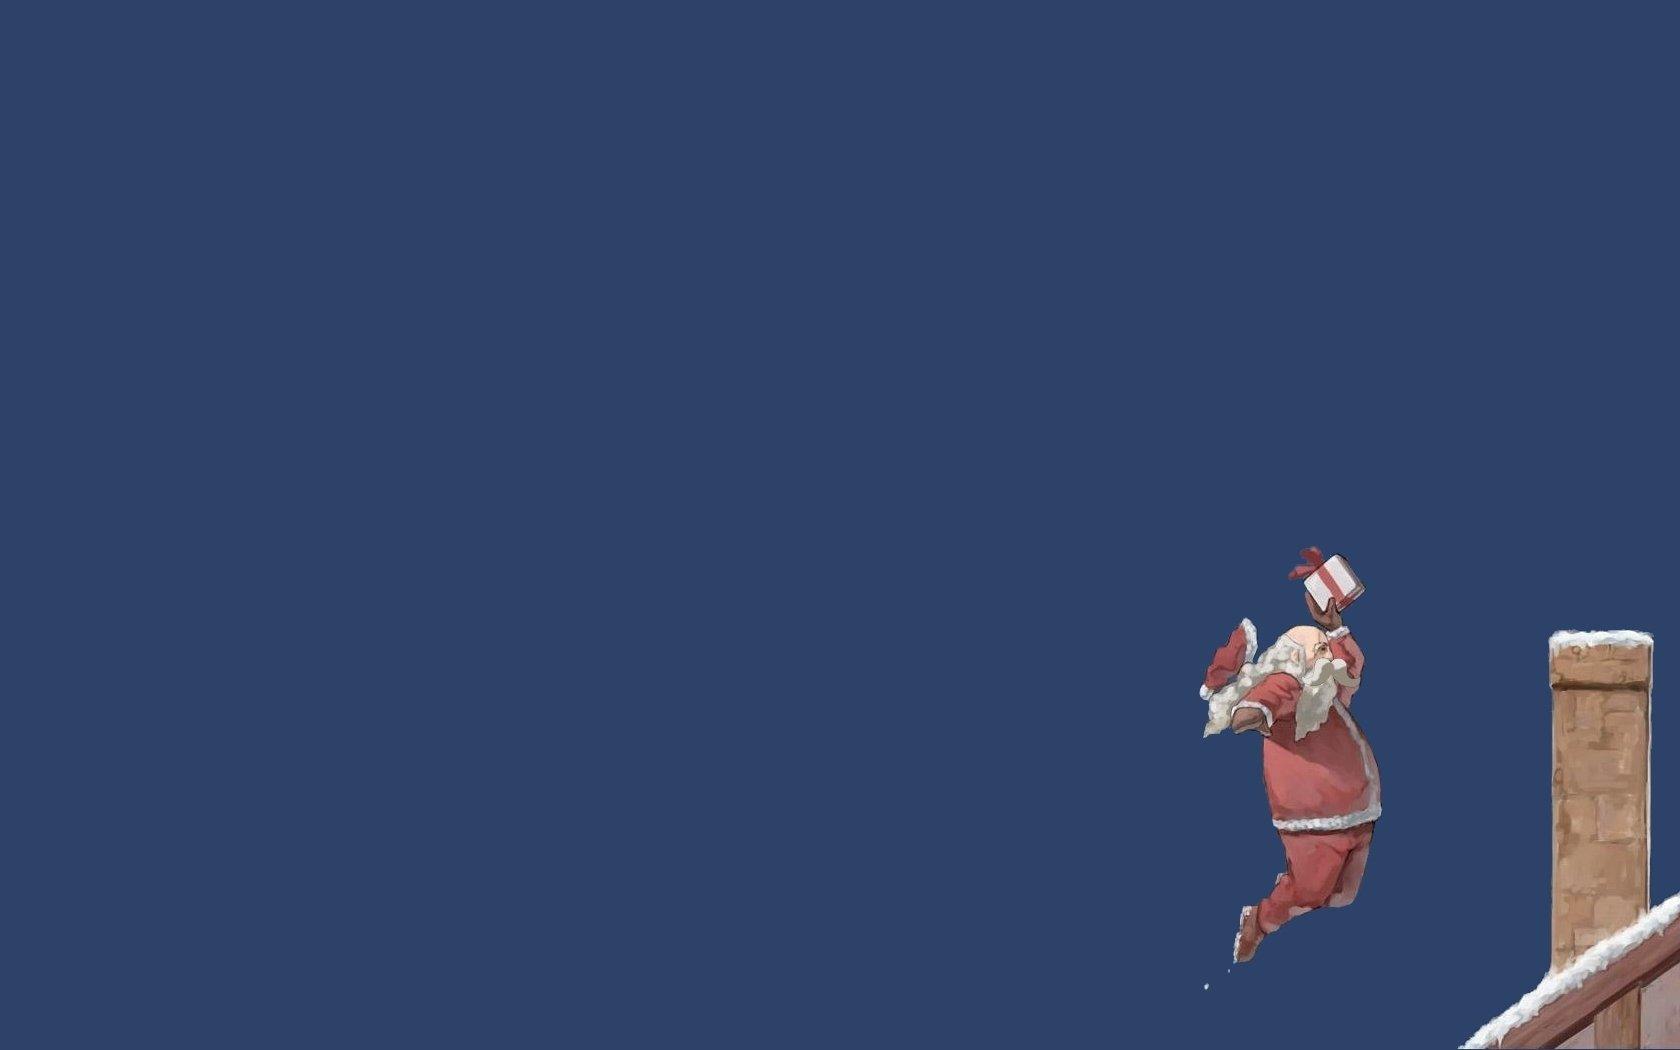 funny christmas santa claus basketball wallpaper 1680x1050 258639 wallpaperup - Funny Christmas Wallpaper